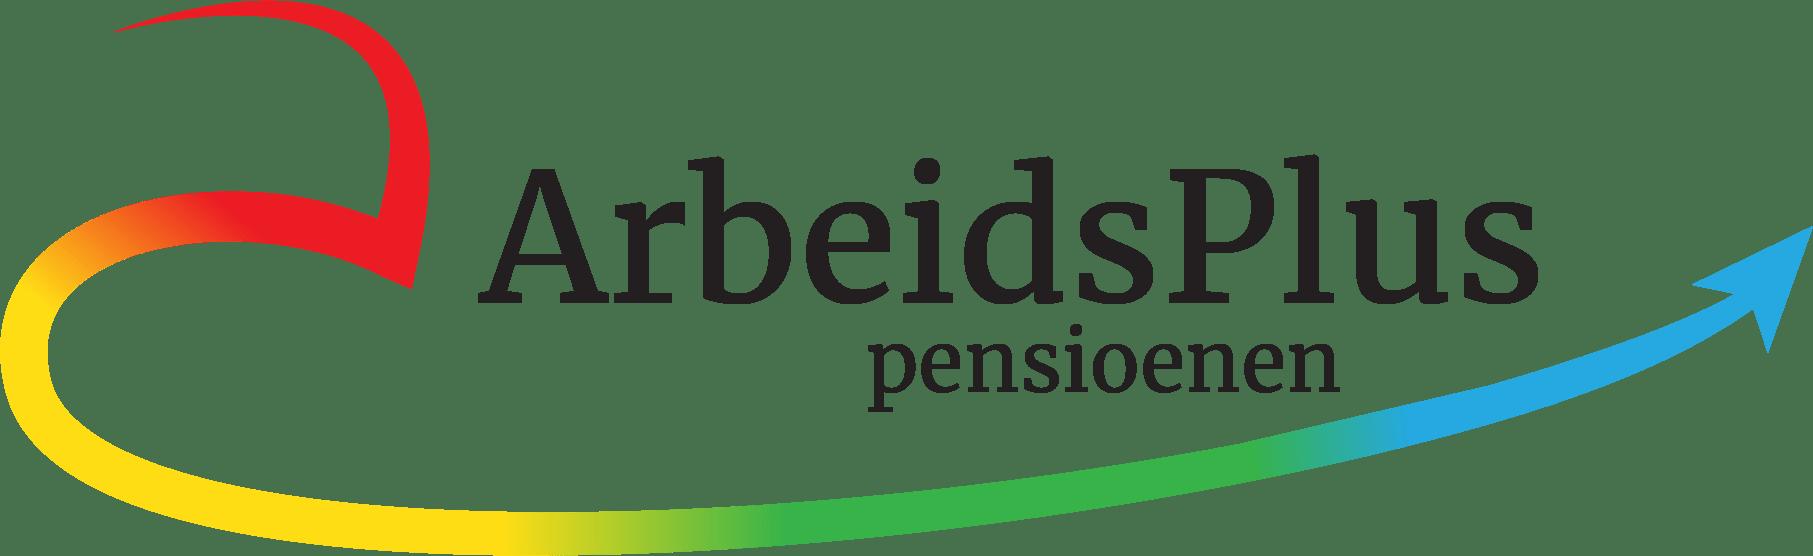 logo_arbeidsplus_pensioenen_HR